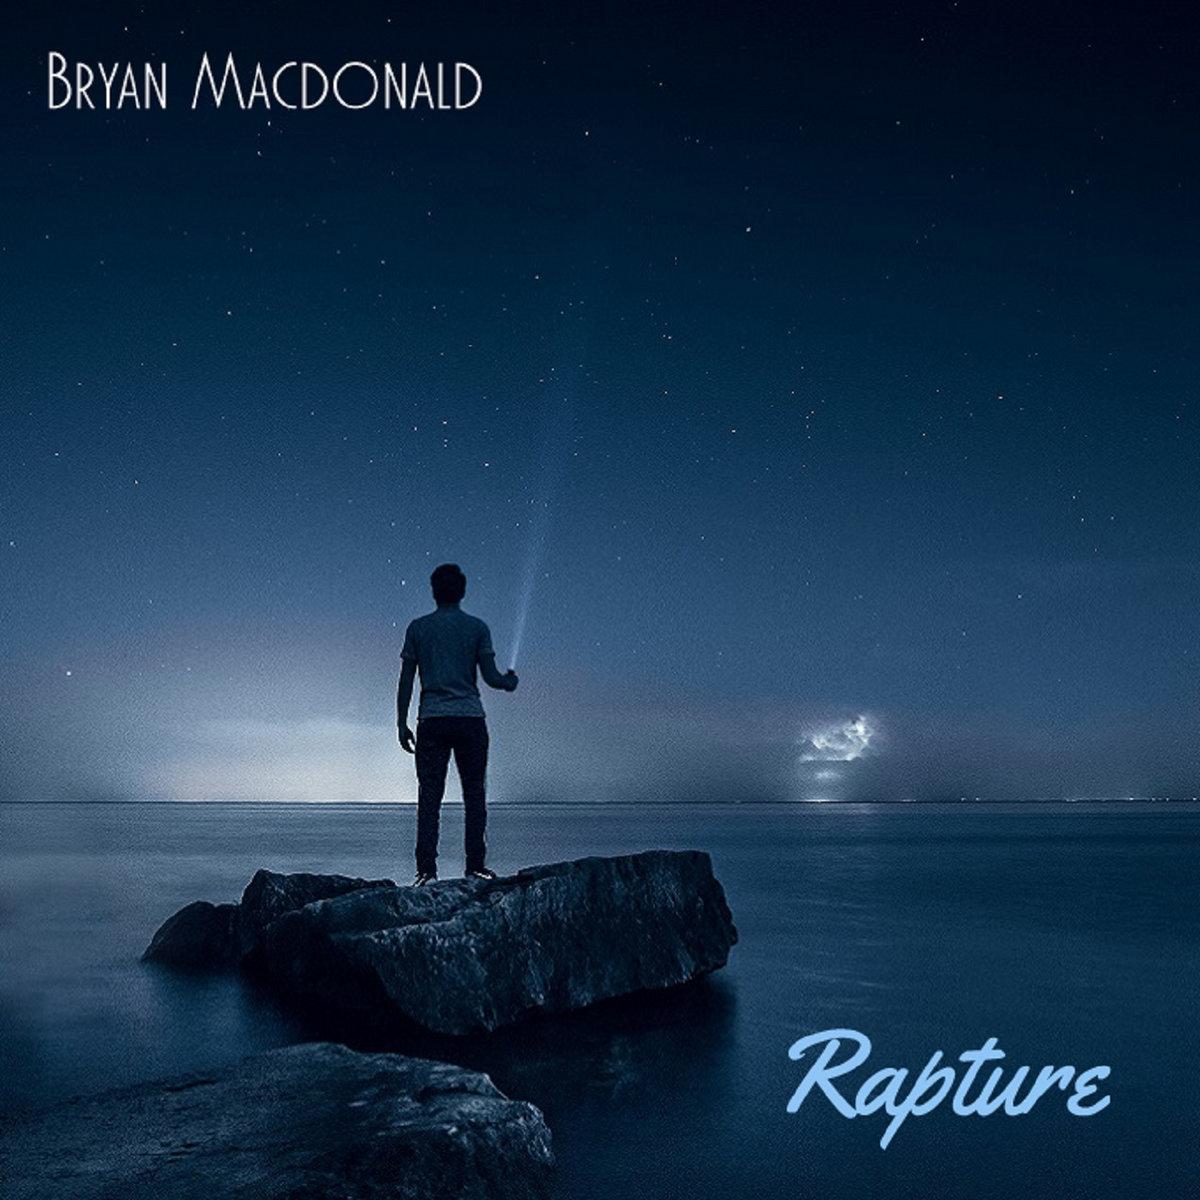 Rapture - single by Bryan Macdonald